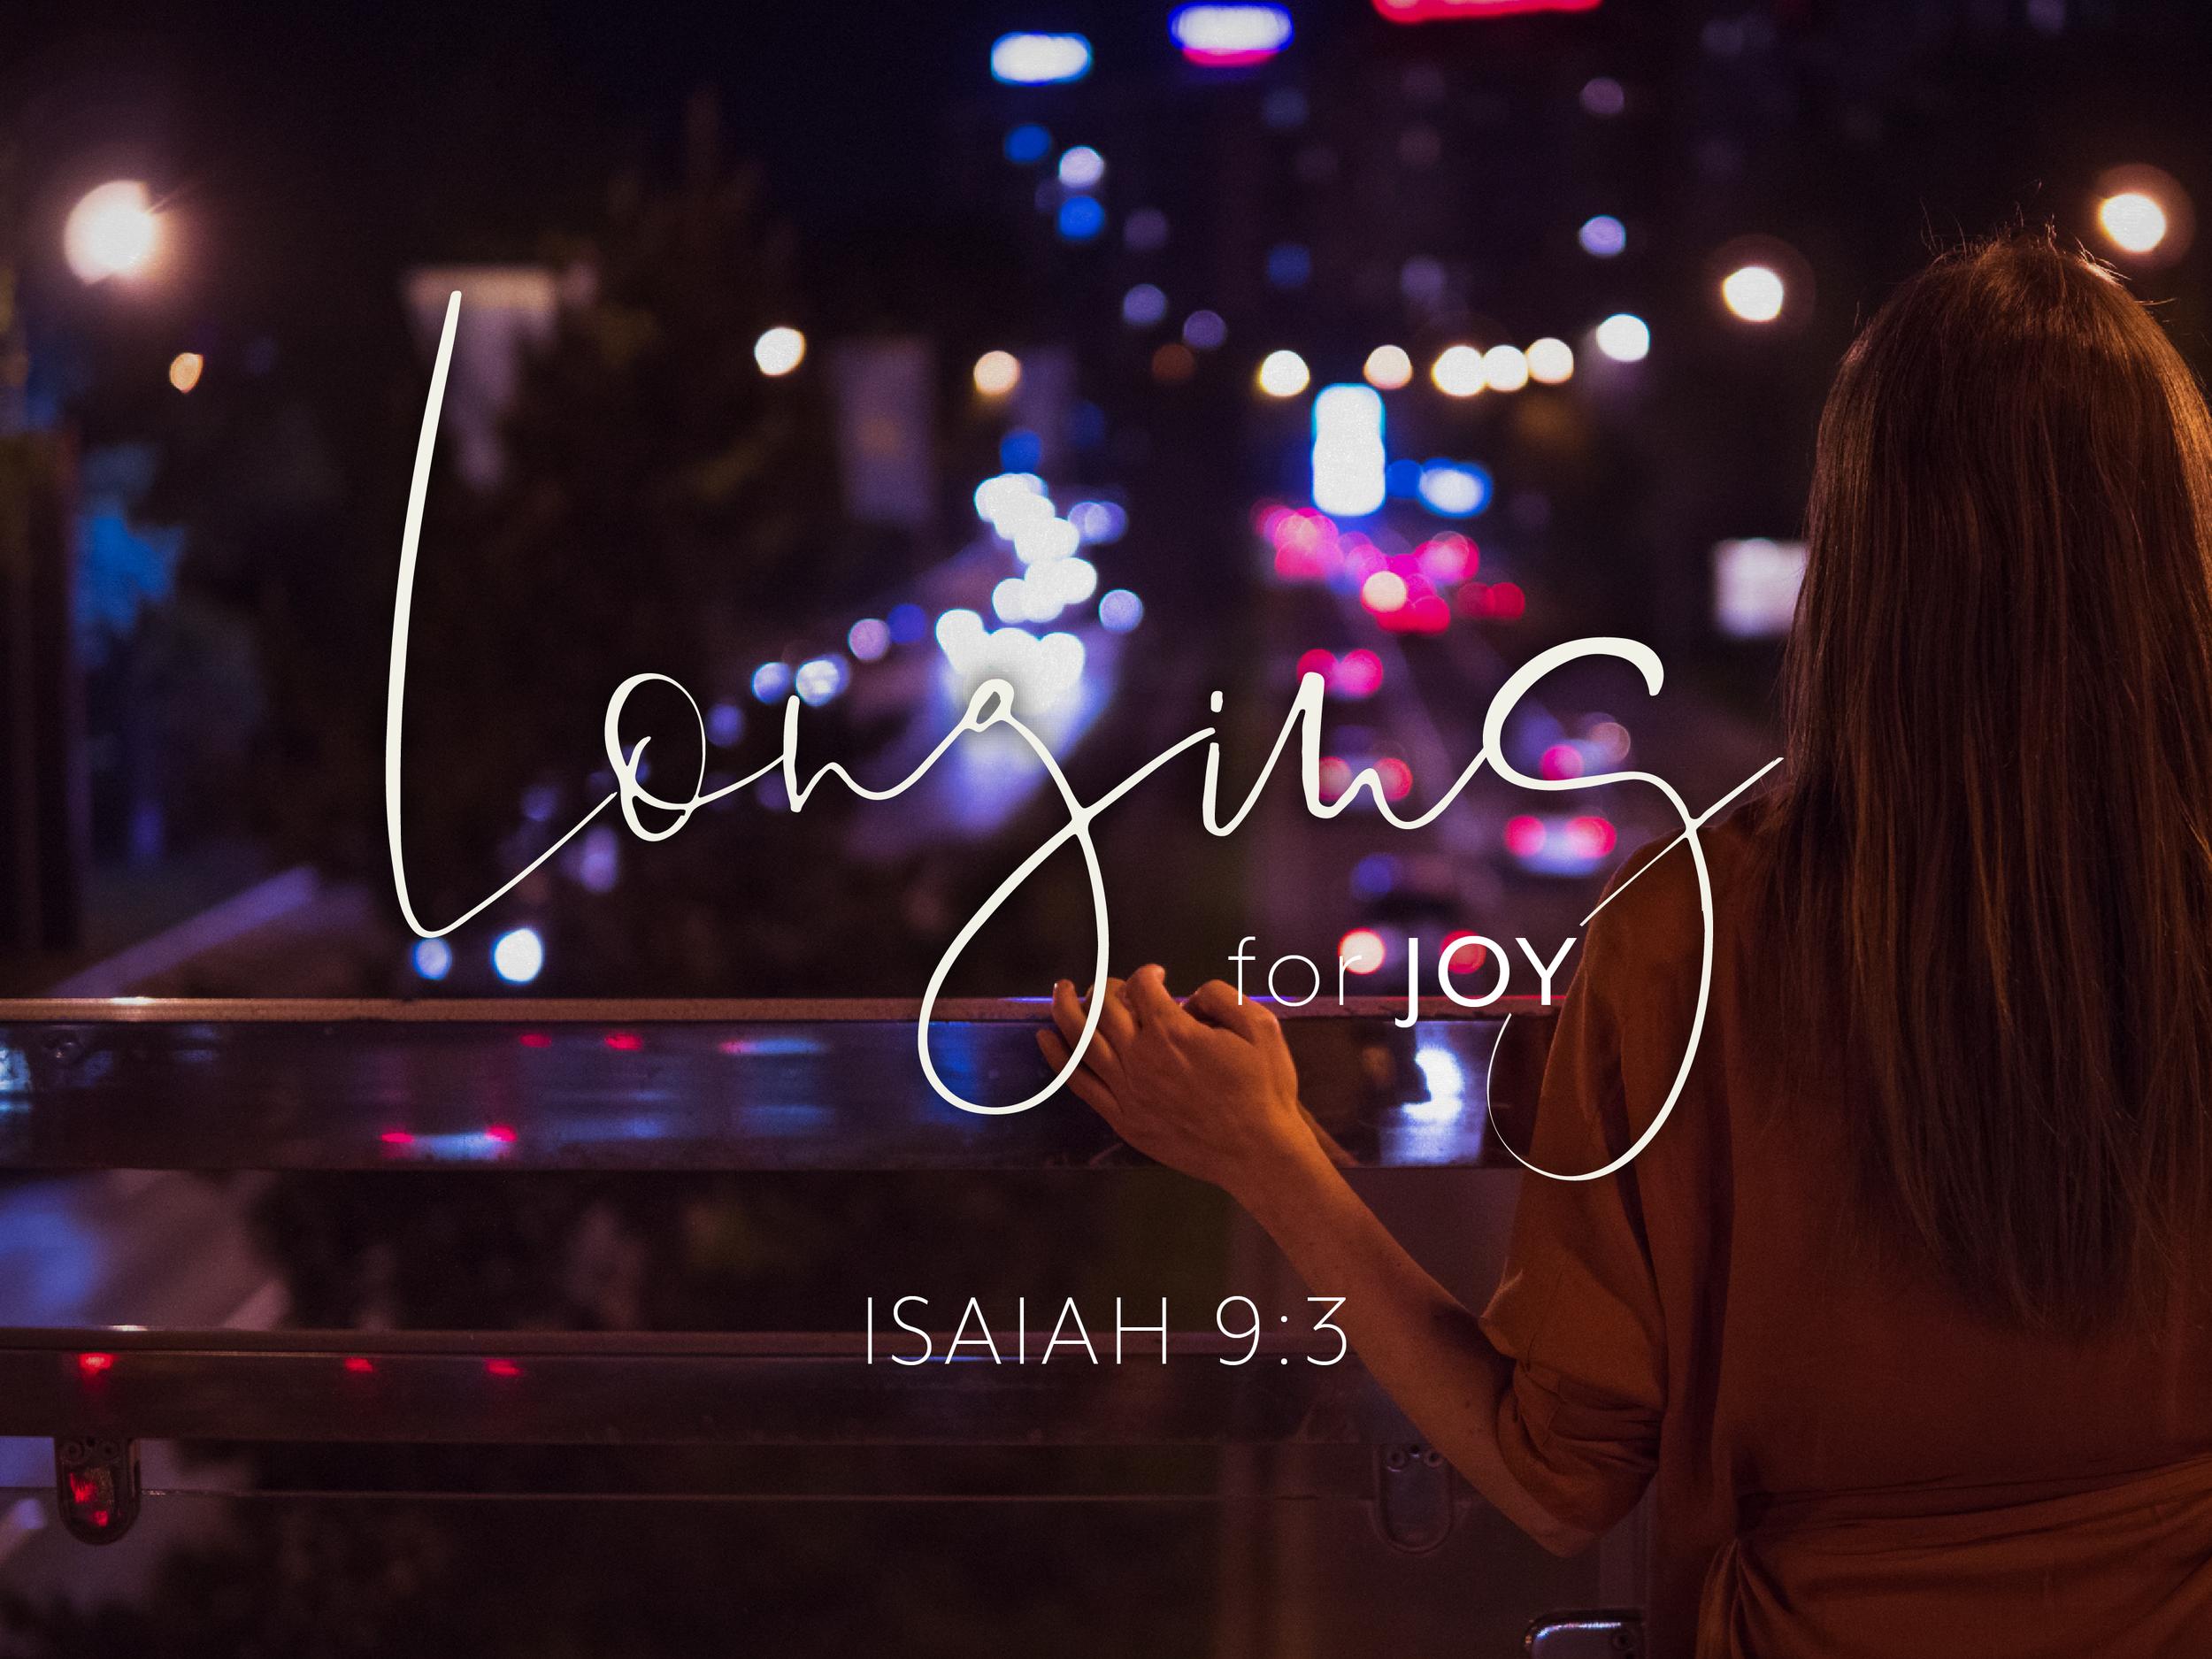 Longing_Title-Joy.png